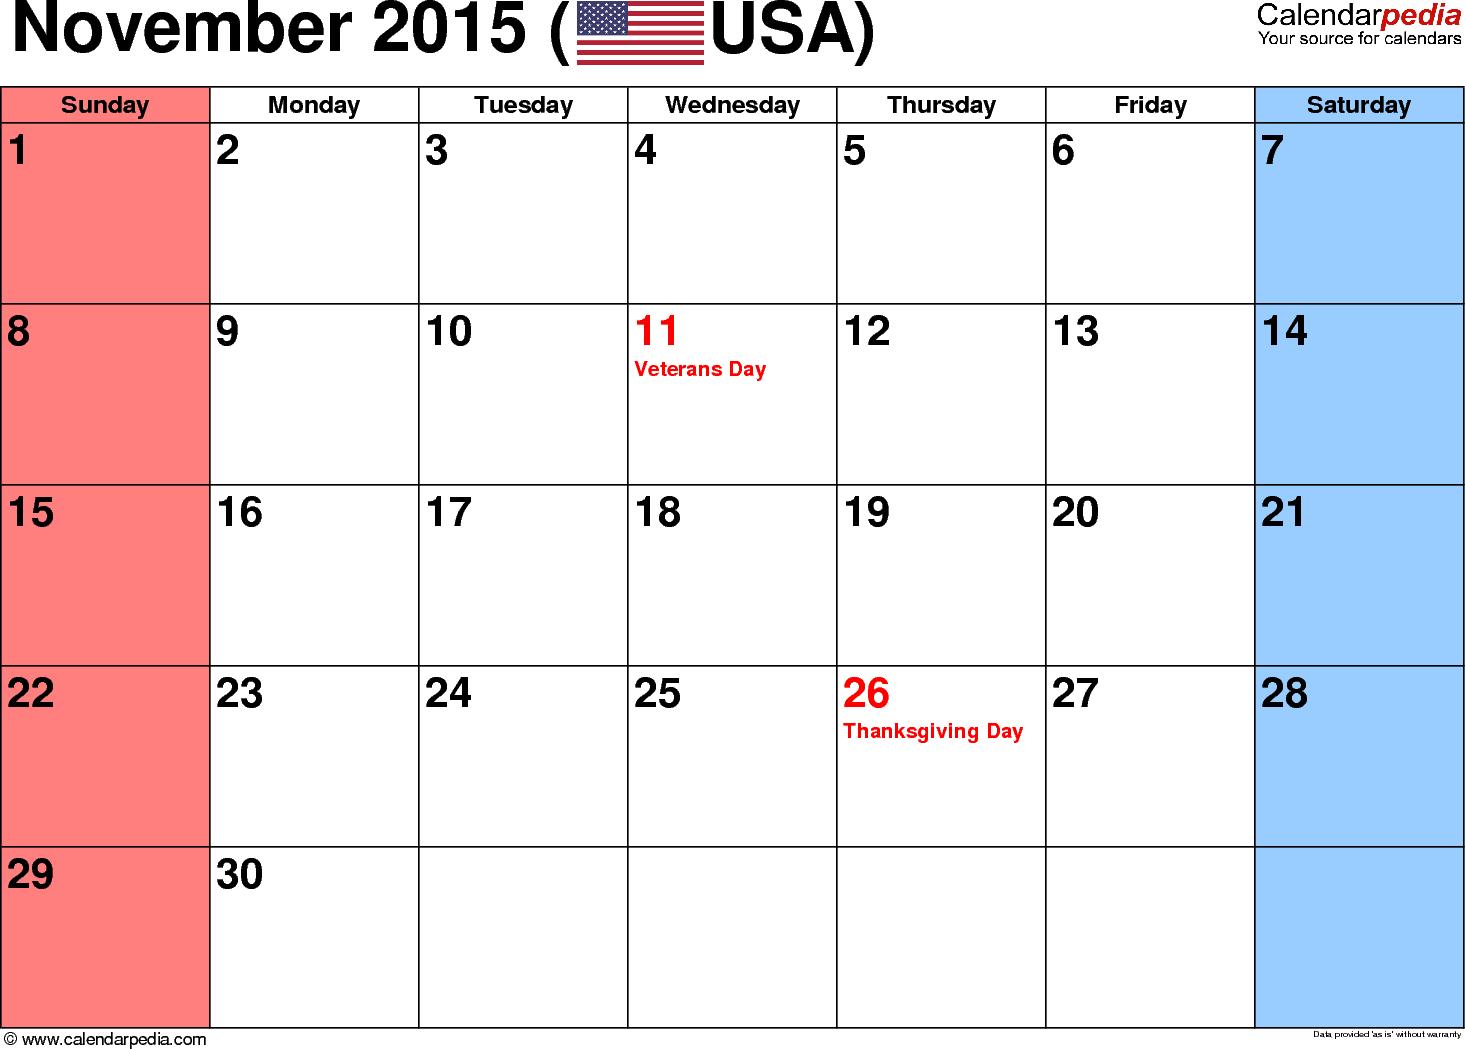 Blank November 2015 calendar